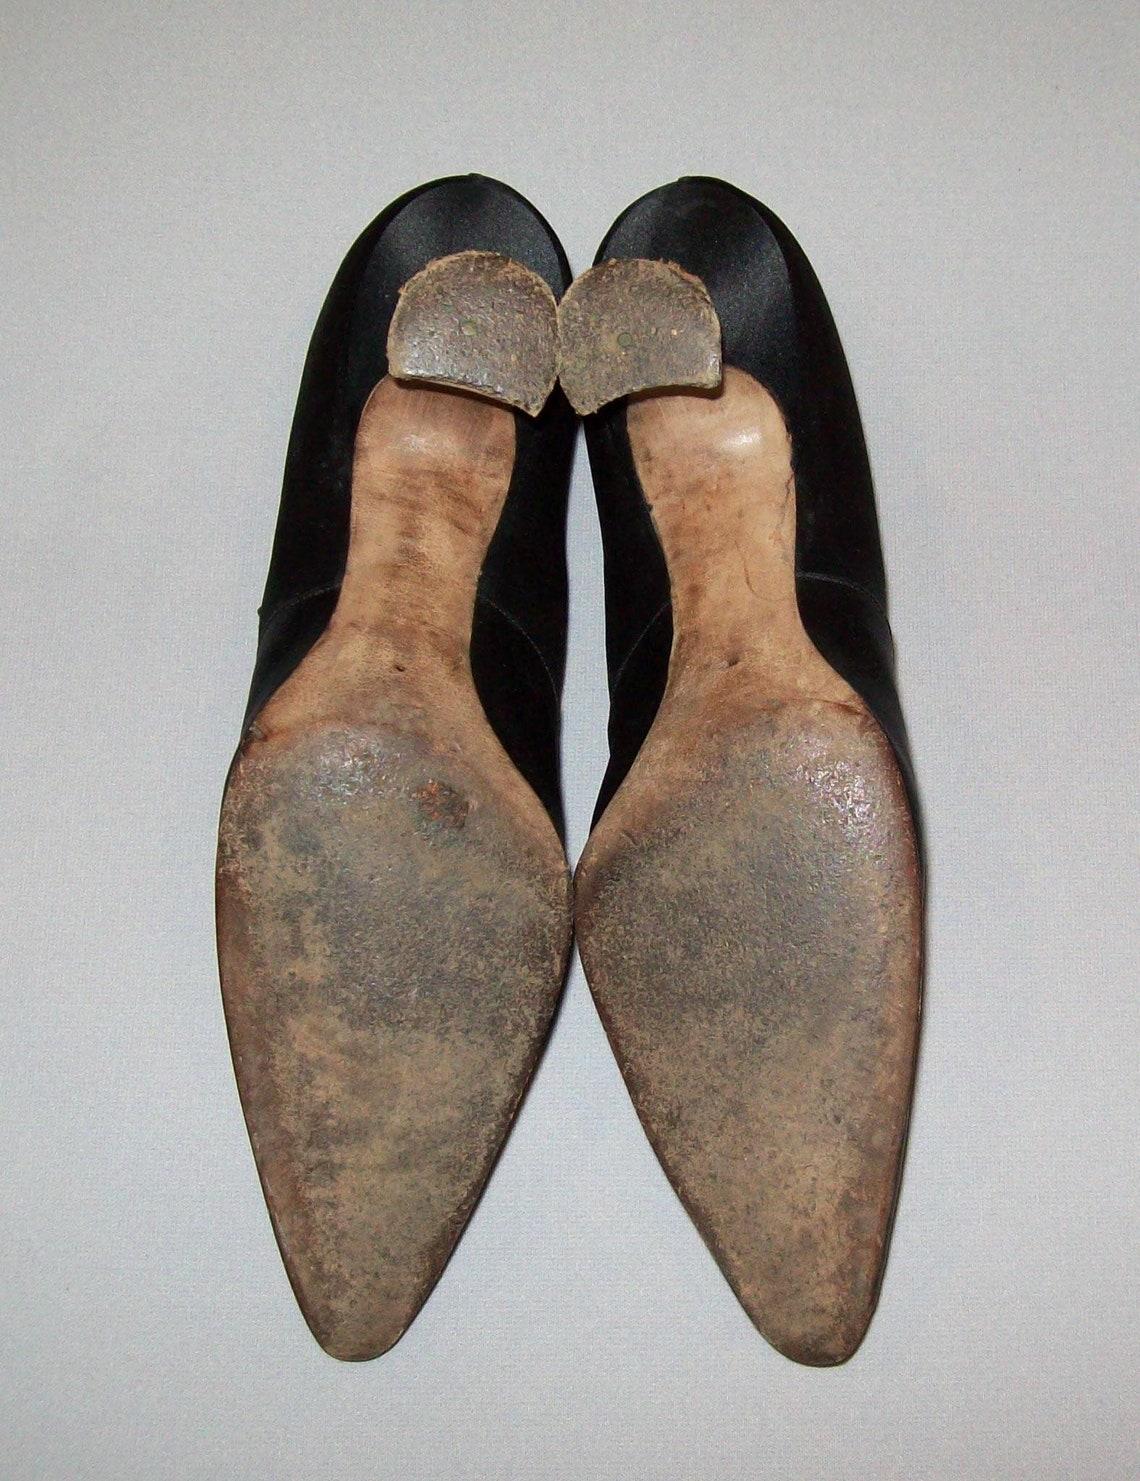 Antiquariato Vtg 19th C 1890s Edwardian Ladies High Heel Black Silk Shoess Size 5 Vittorian - Scarpe alla moda vrK0L93n beYTOj qegY7U